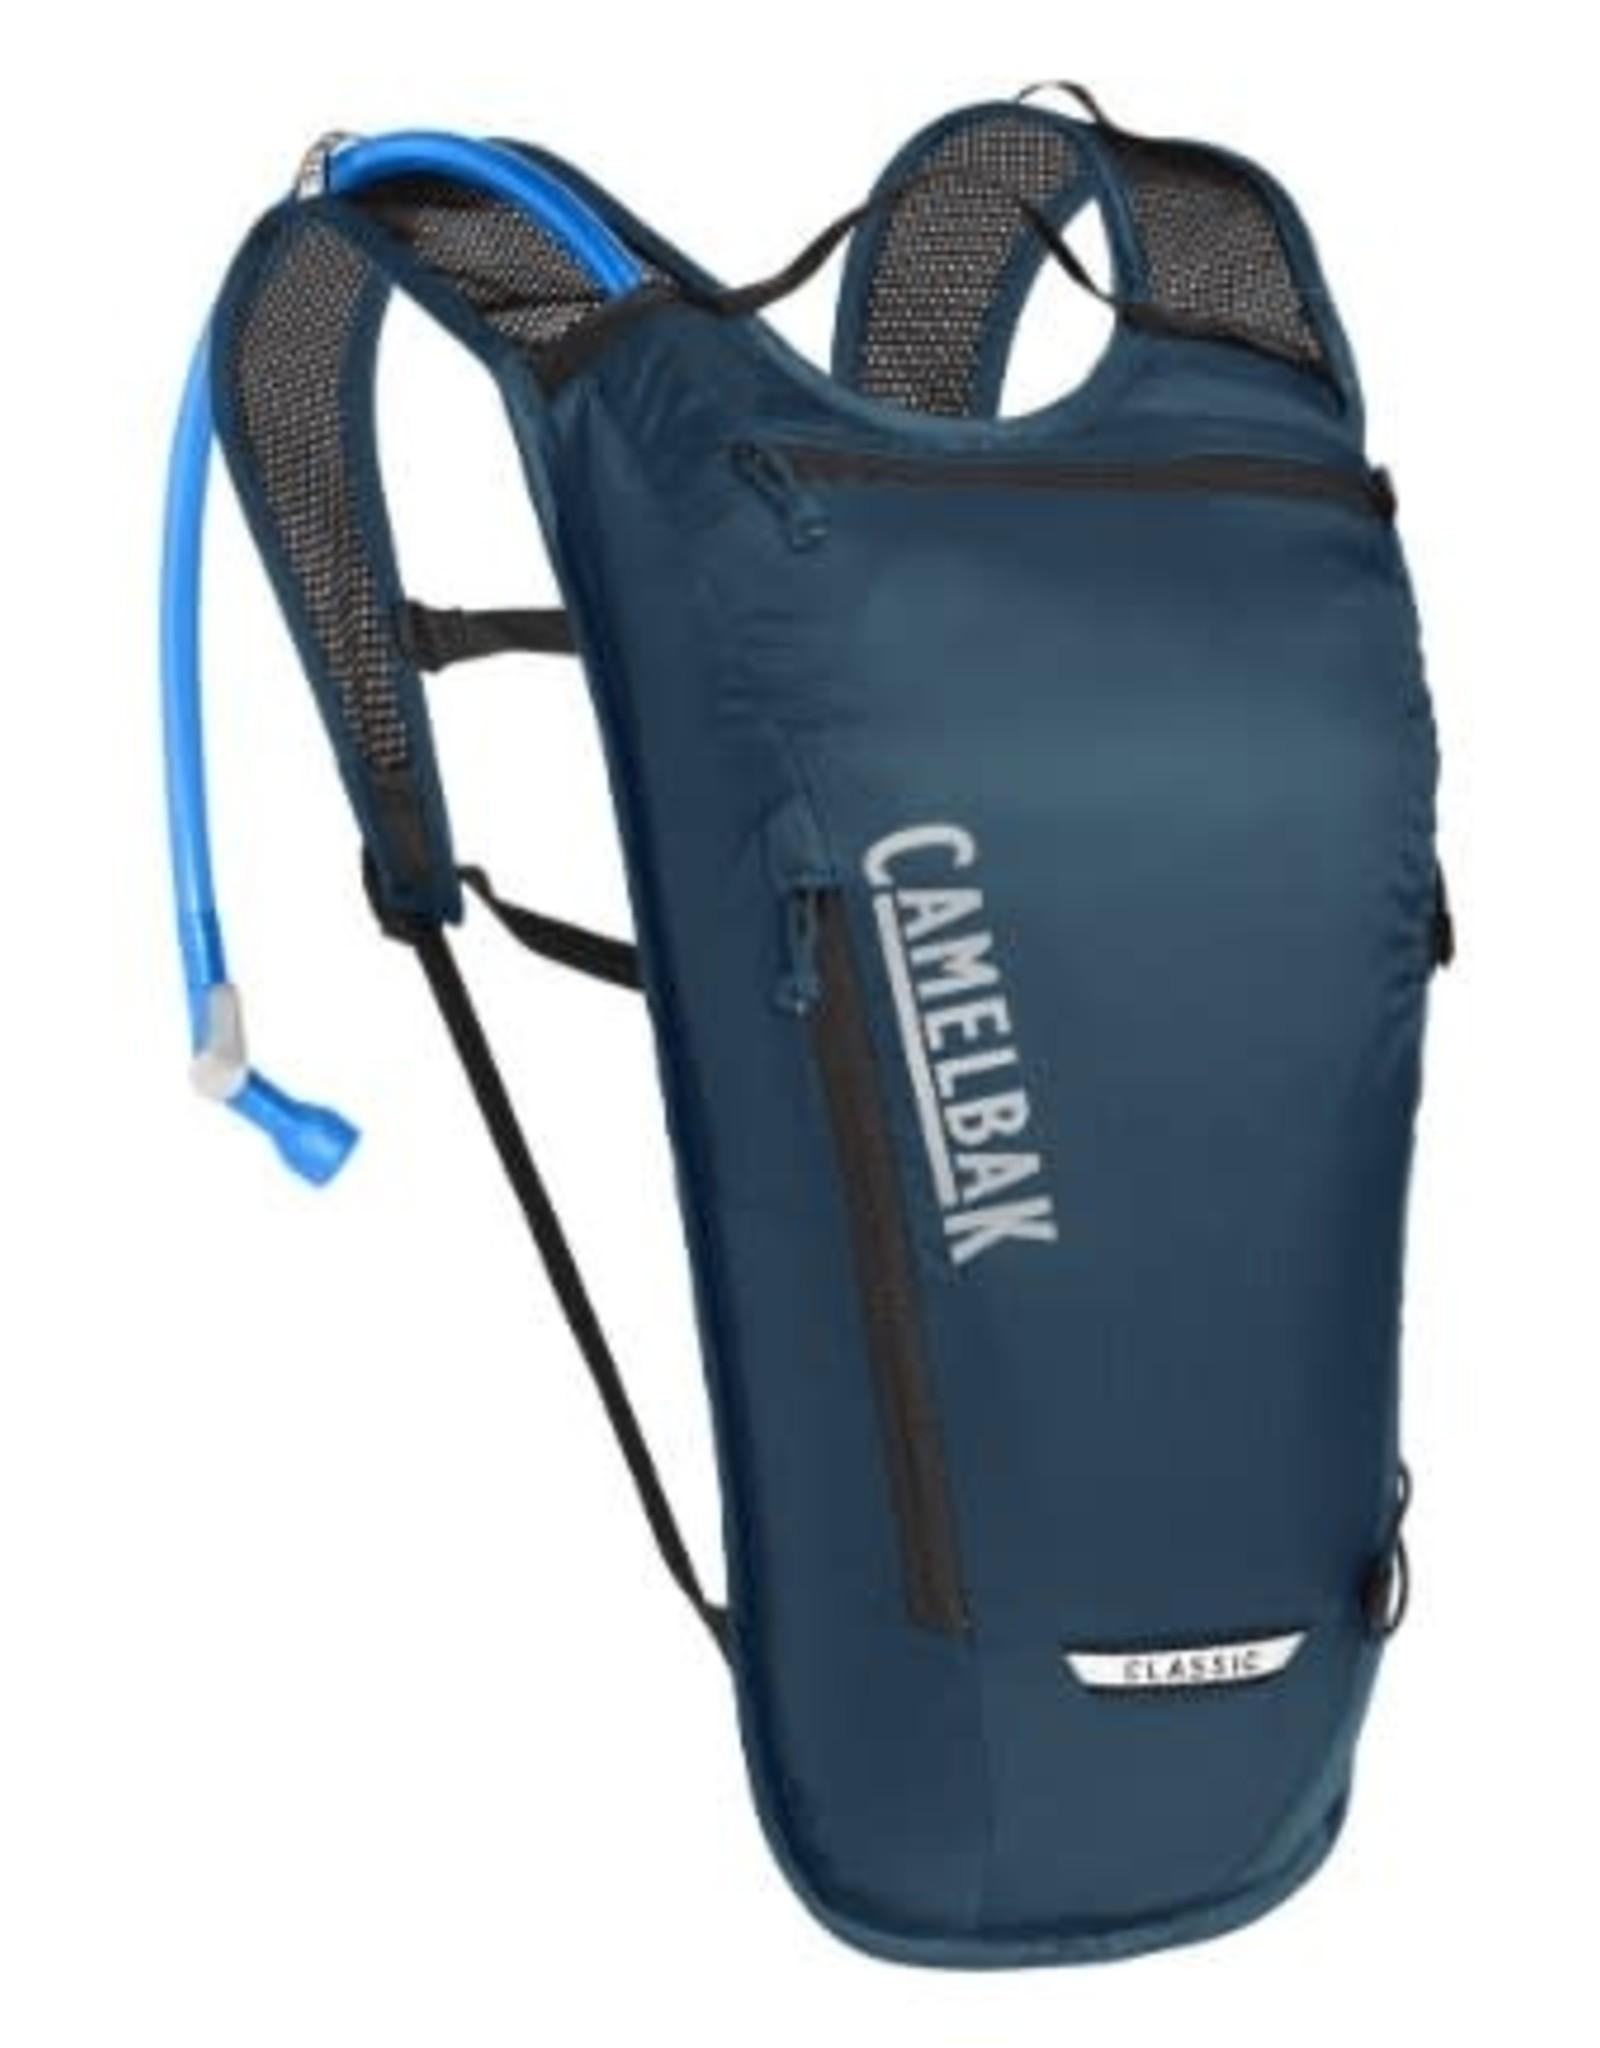 Camelbak Hydratation bag Camelbak Classic Light 70oz/2L